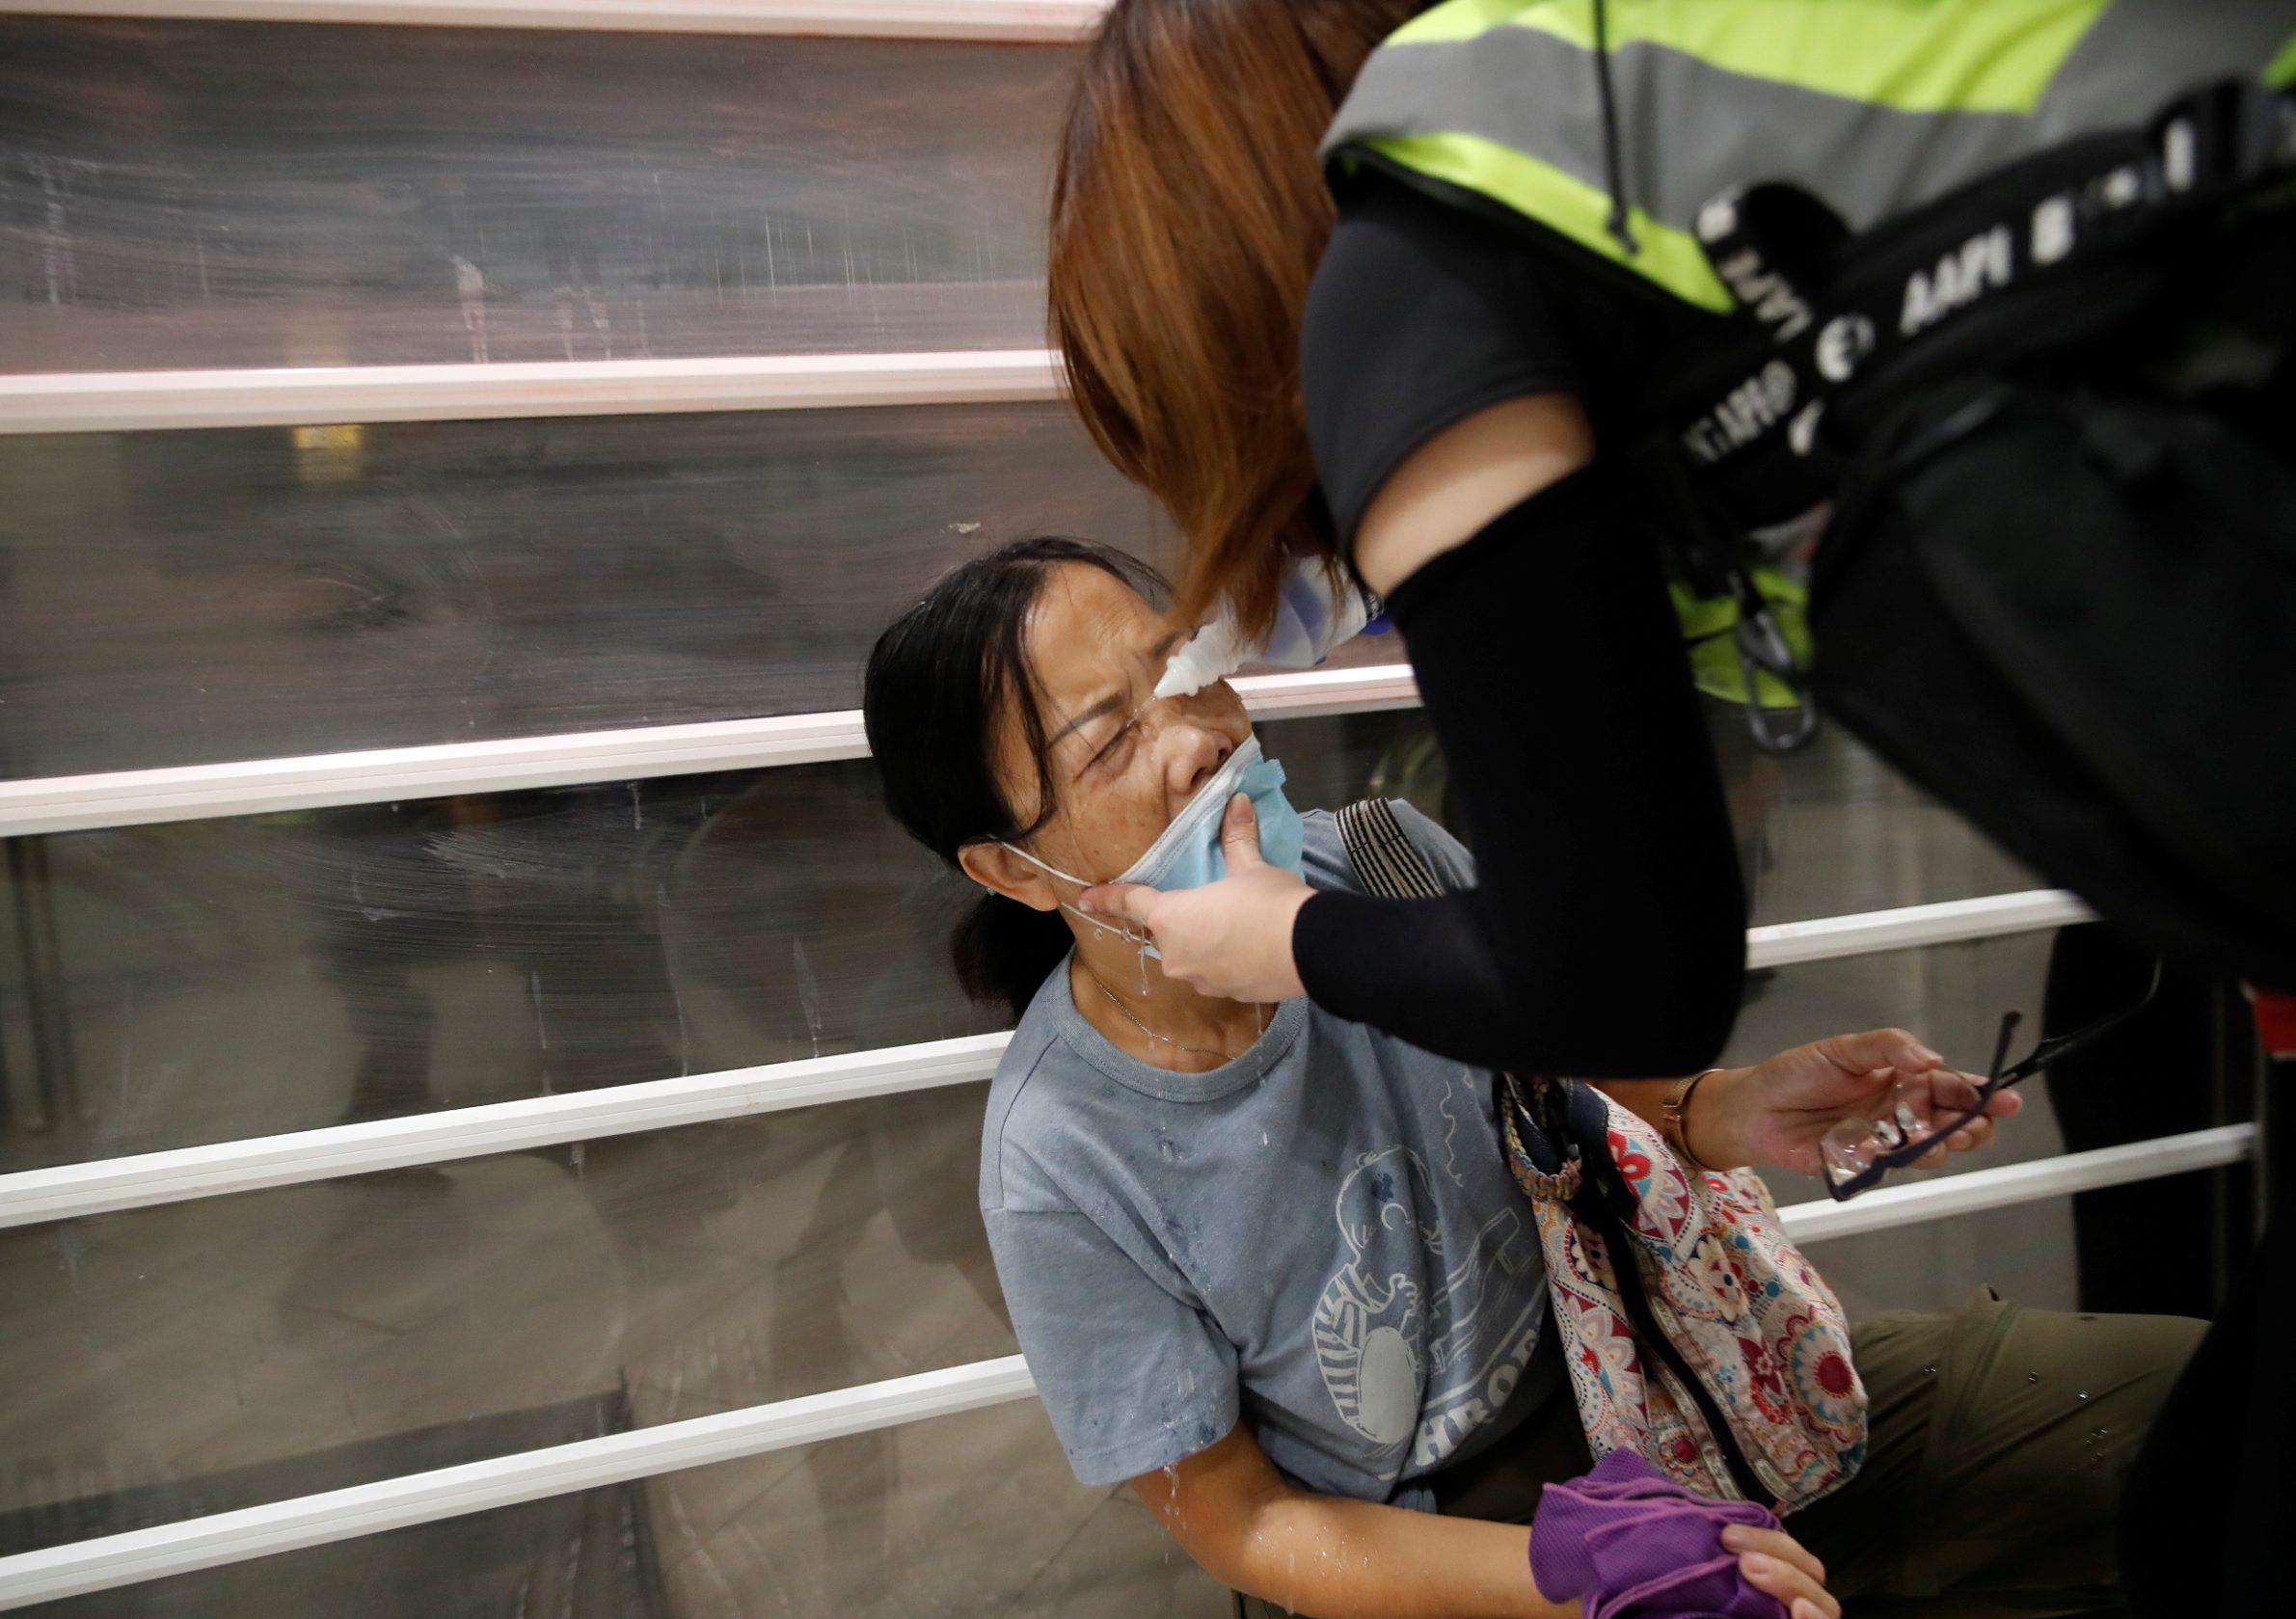 2019-11-03T155522Z_1116455039_RC1D5A9C63B0_RTRMADP_3_HONG-KONG-PROTESTS